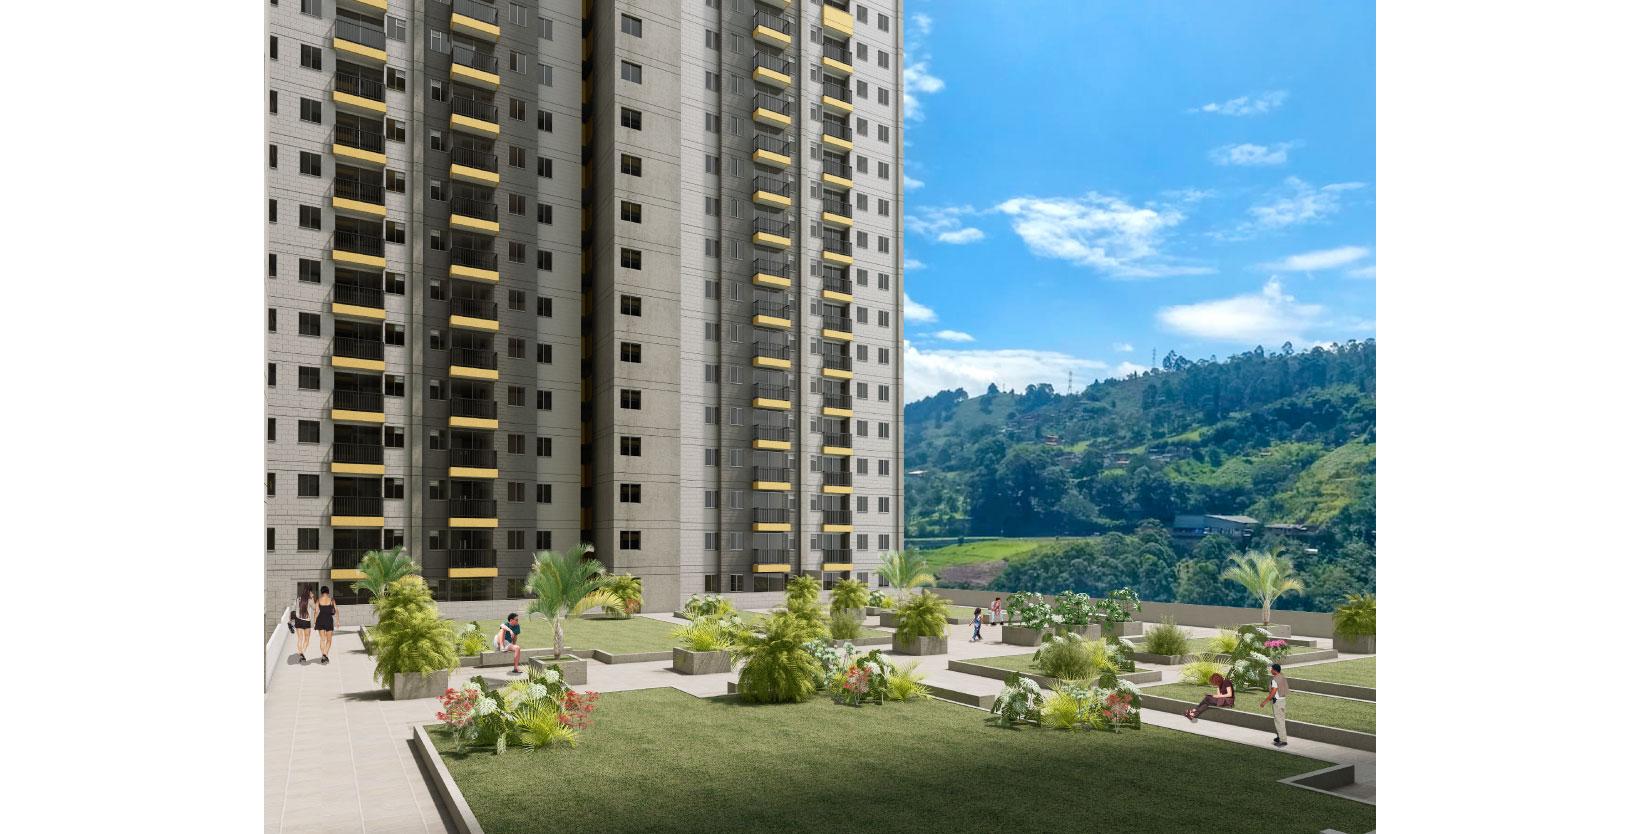 4_apartamentos_sierra_morena_zona_verde